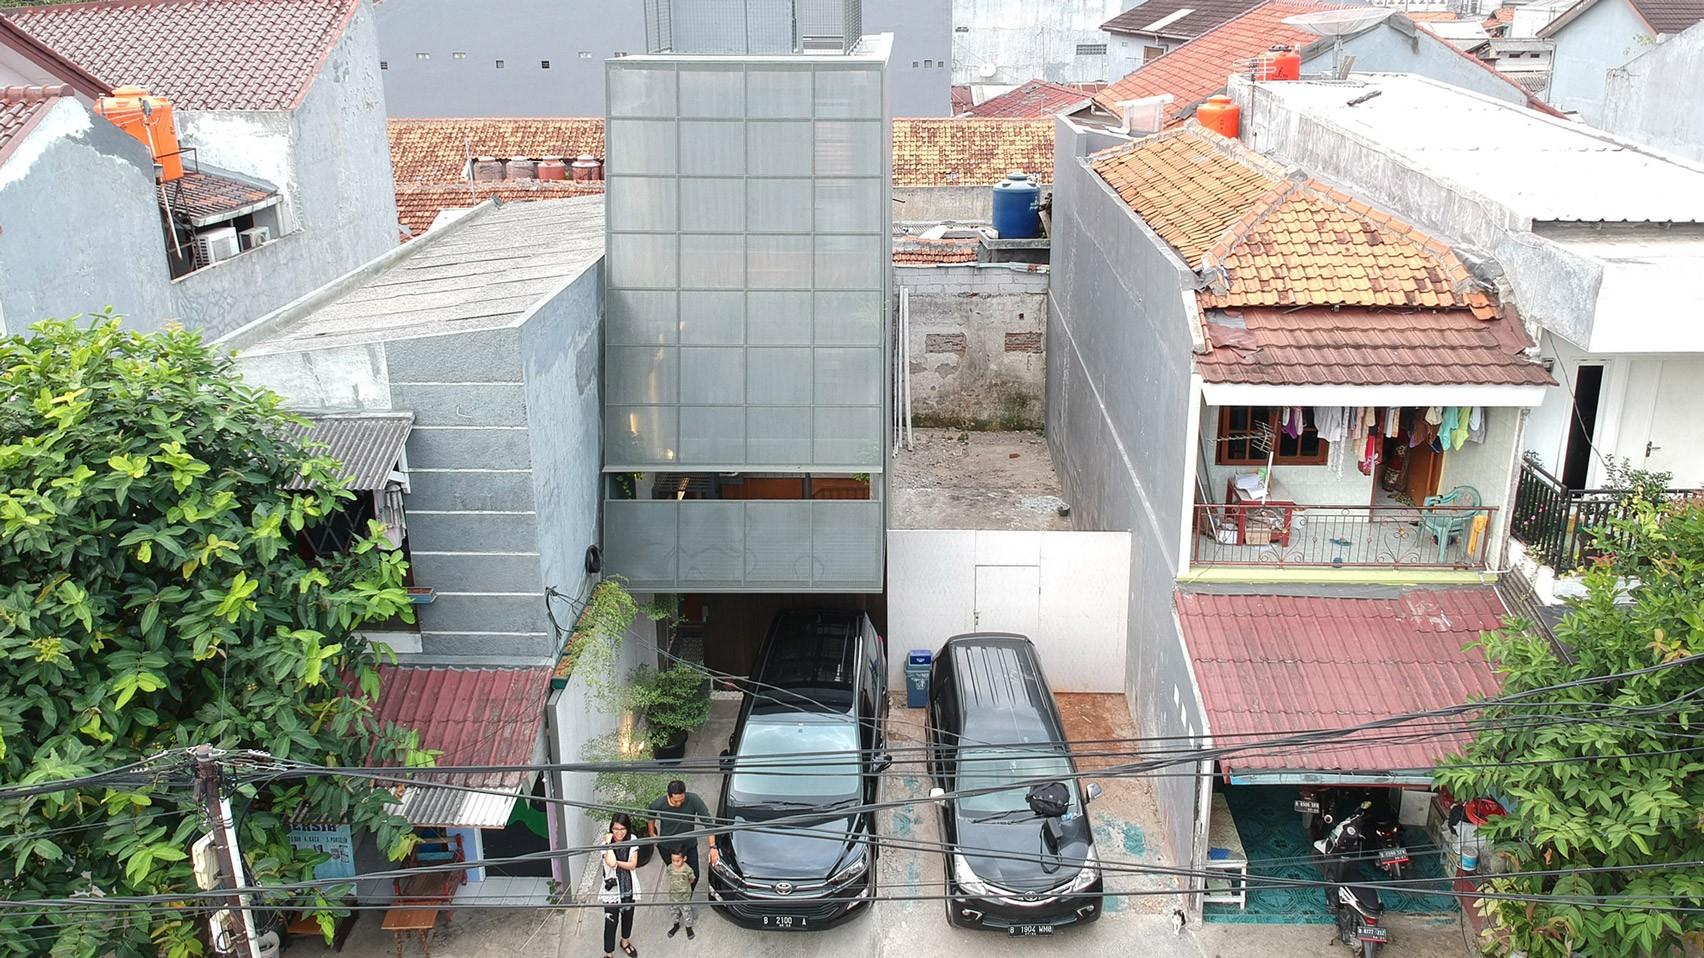 3500-millimetre-house-ago-architects-architecture-residential-indonesia-skinny-houses_dezeen_2364_hero